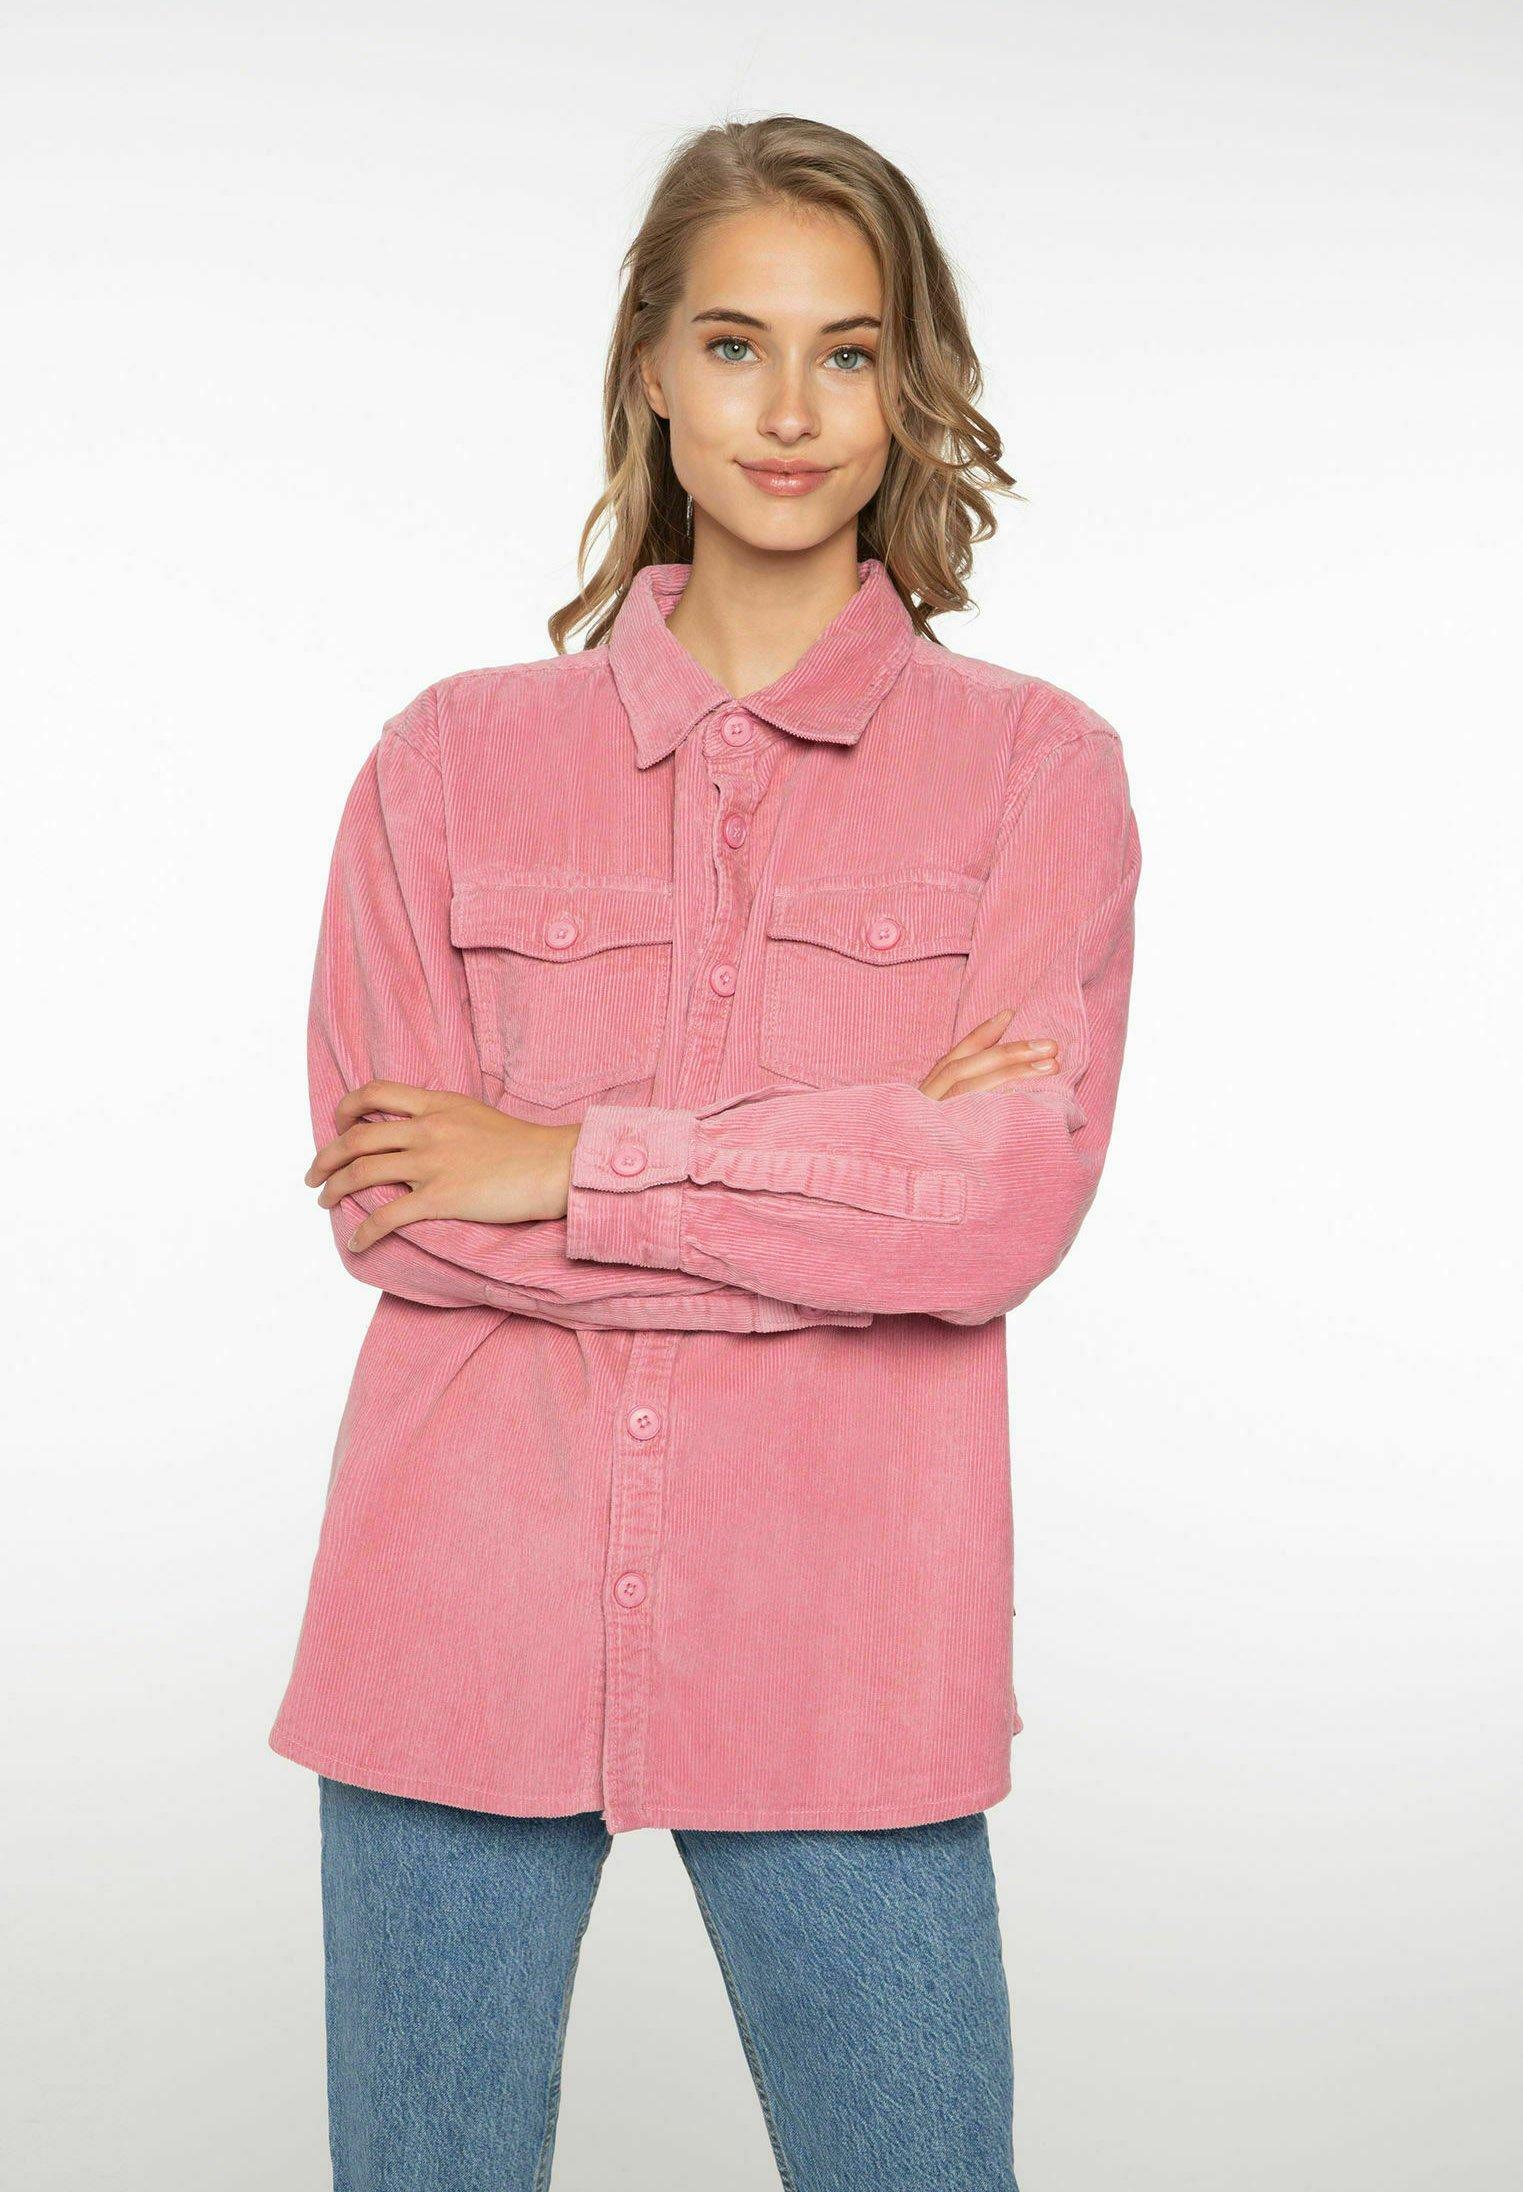 Donna NINA - Camicia